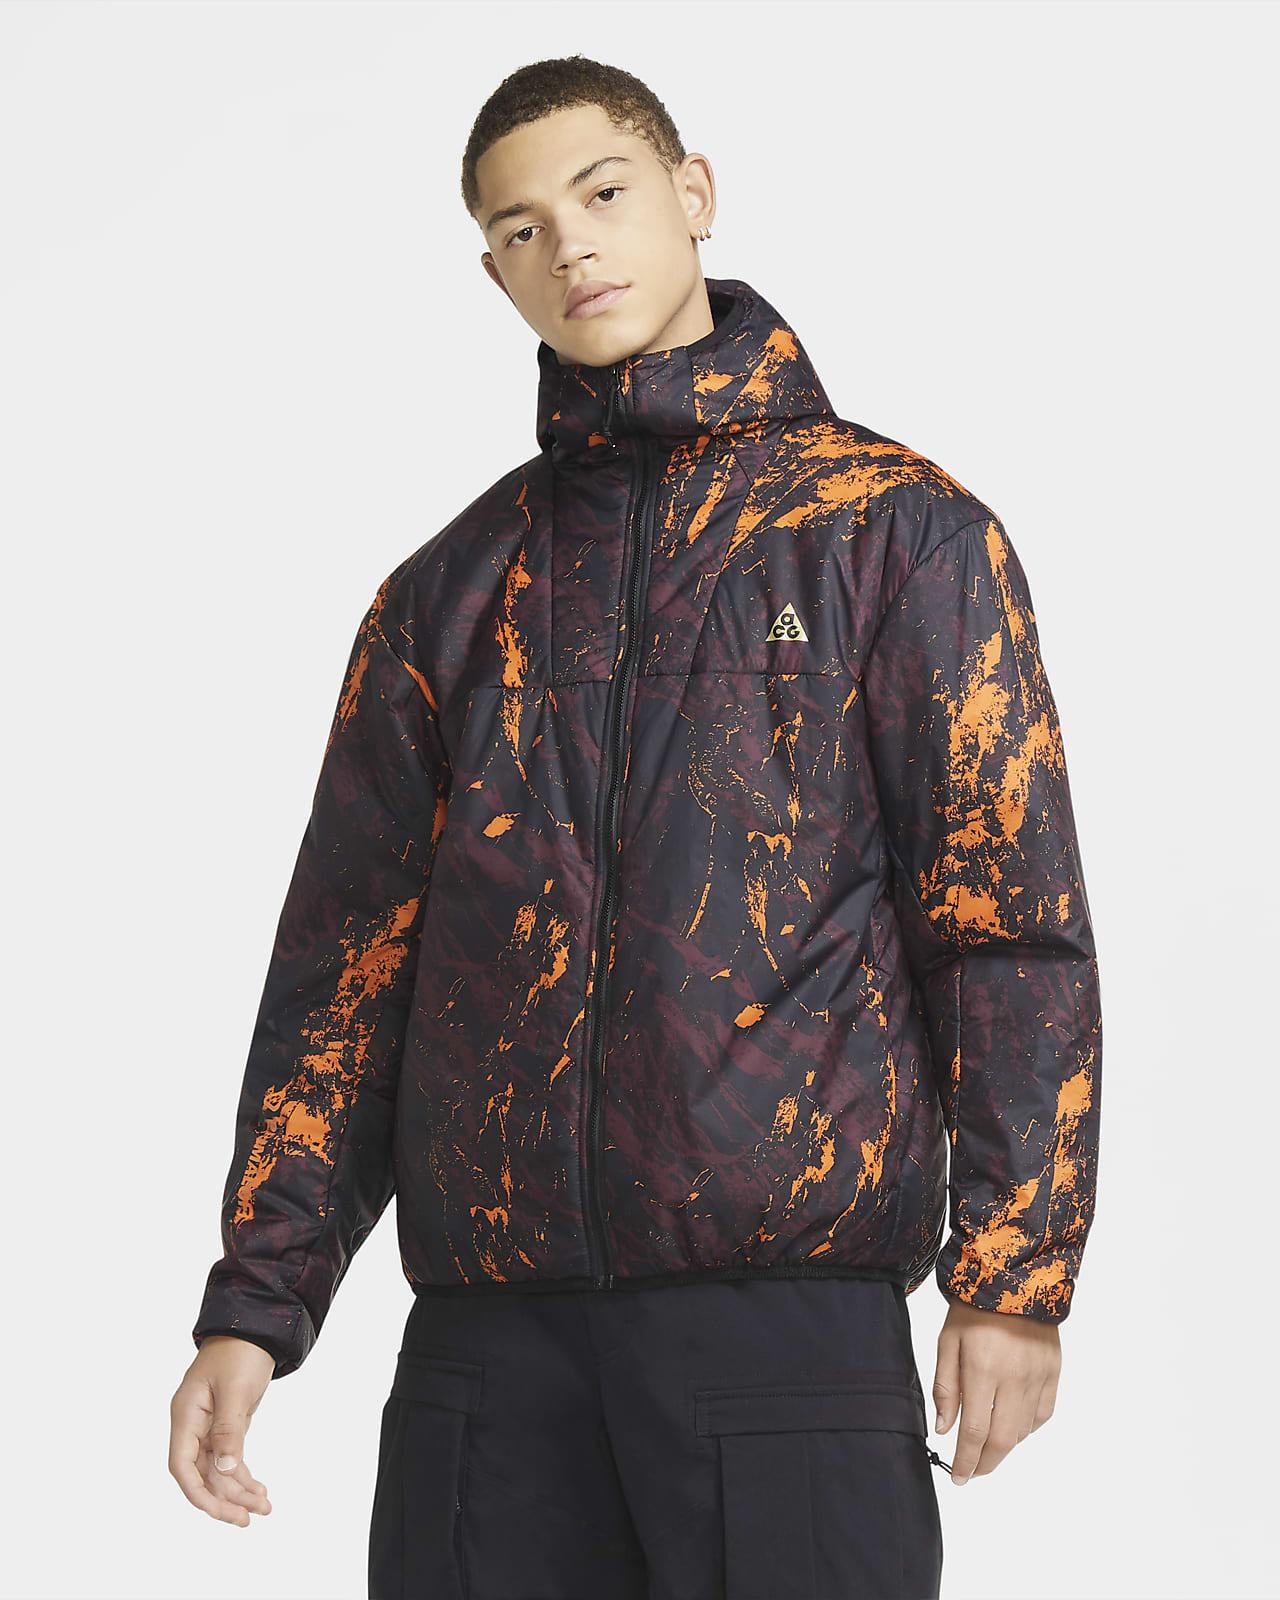 Nike ACG 'Rope de Dope Ultra Rock' Men's Packable Insulated Jacket